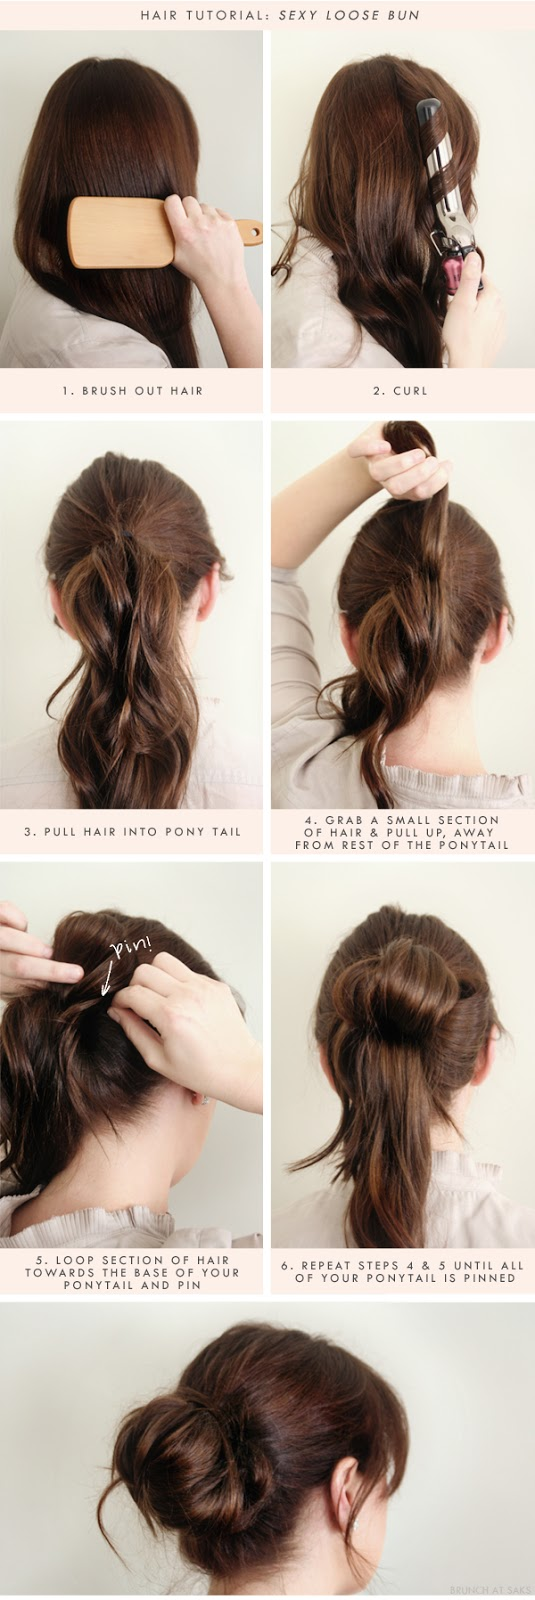 High bun hairstyles step by step